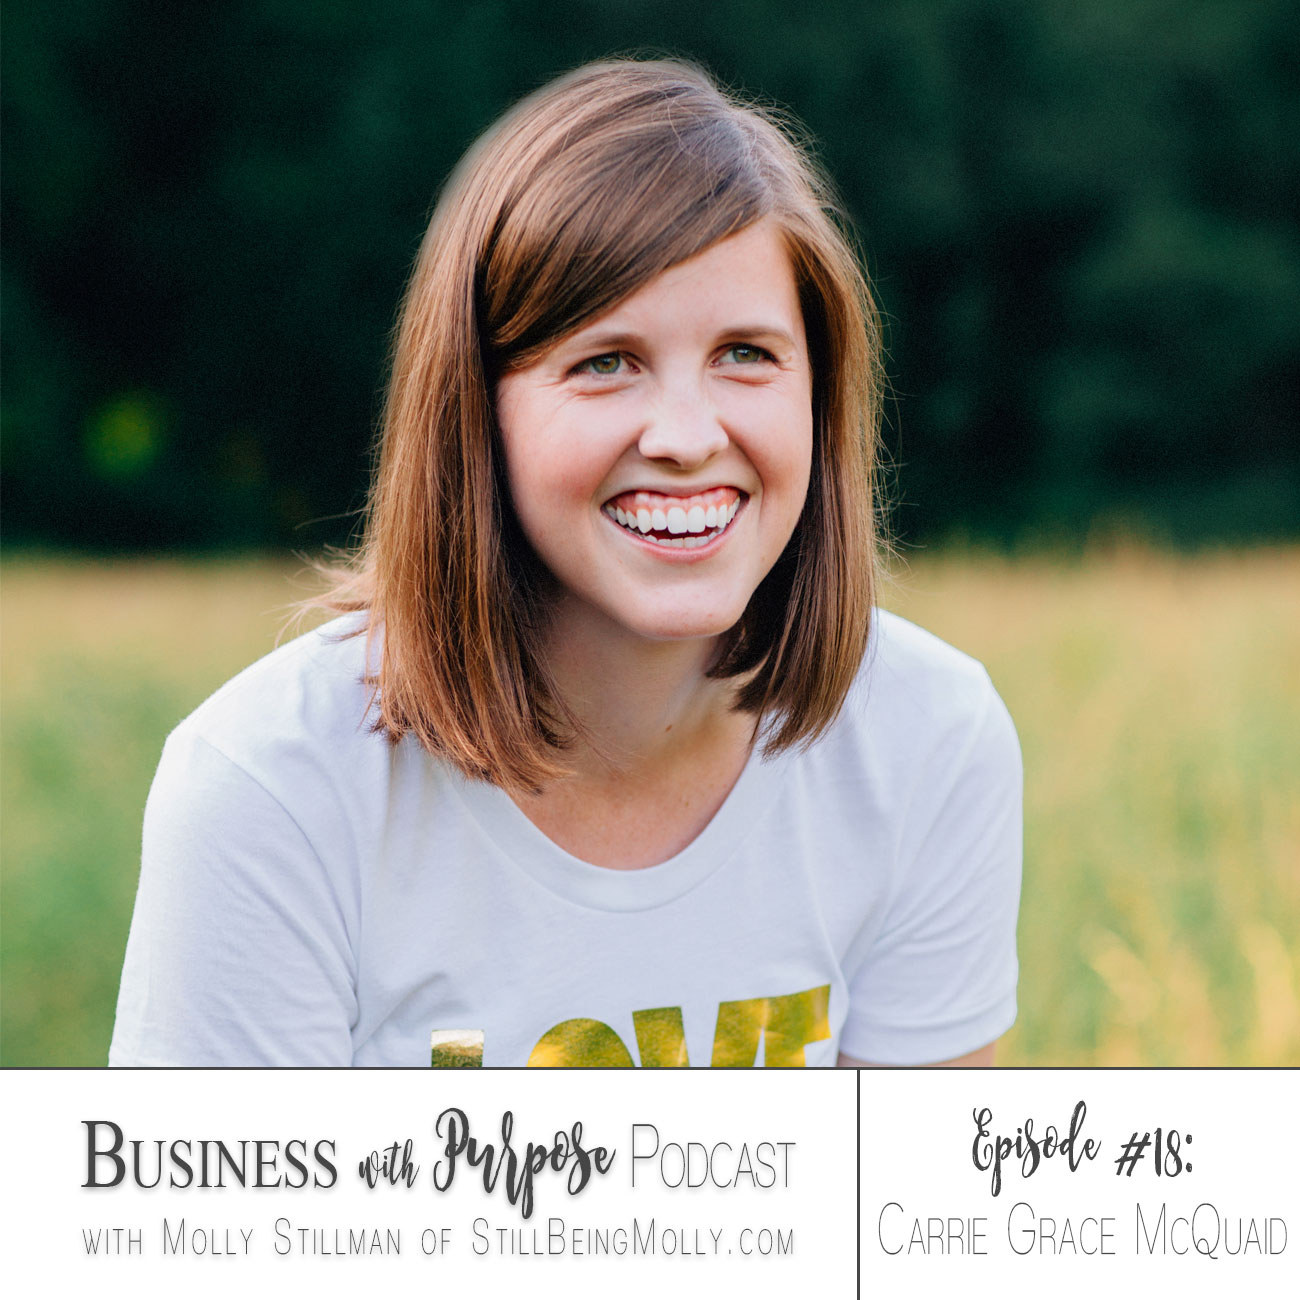 EP 18: Carrie Grace McQuaid - The Kindness Box